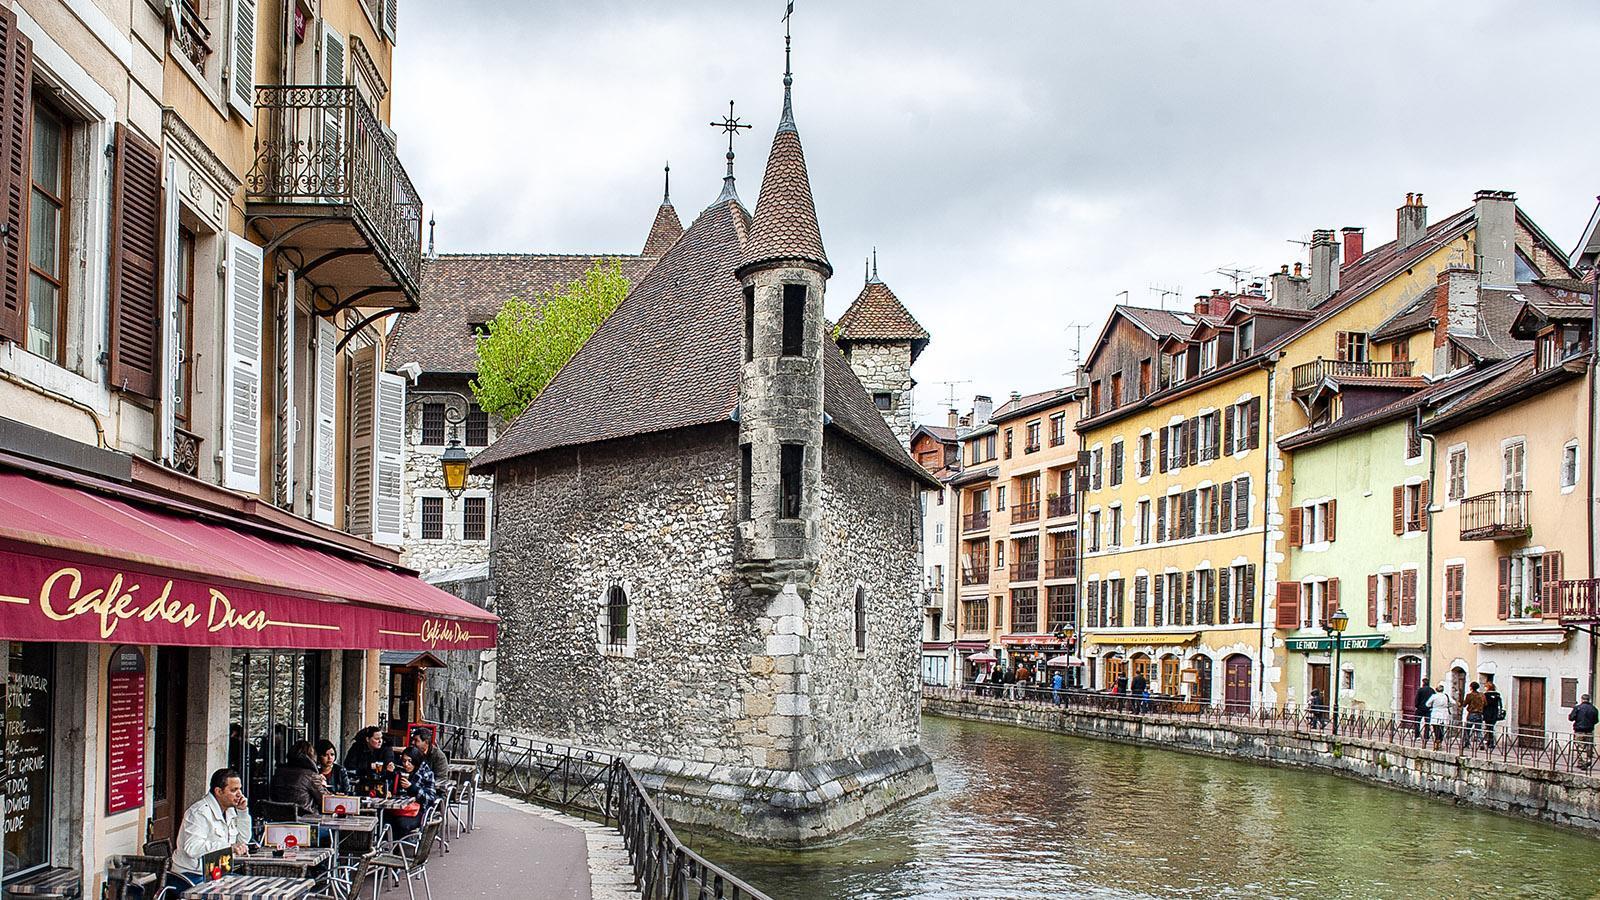 Annecy: An den Kais des Thiou drängen sich die Lokale. Foto: Hilke Maunder